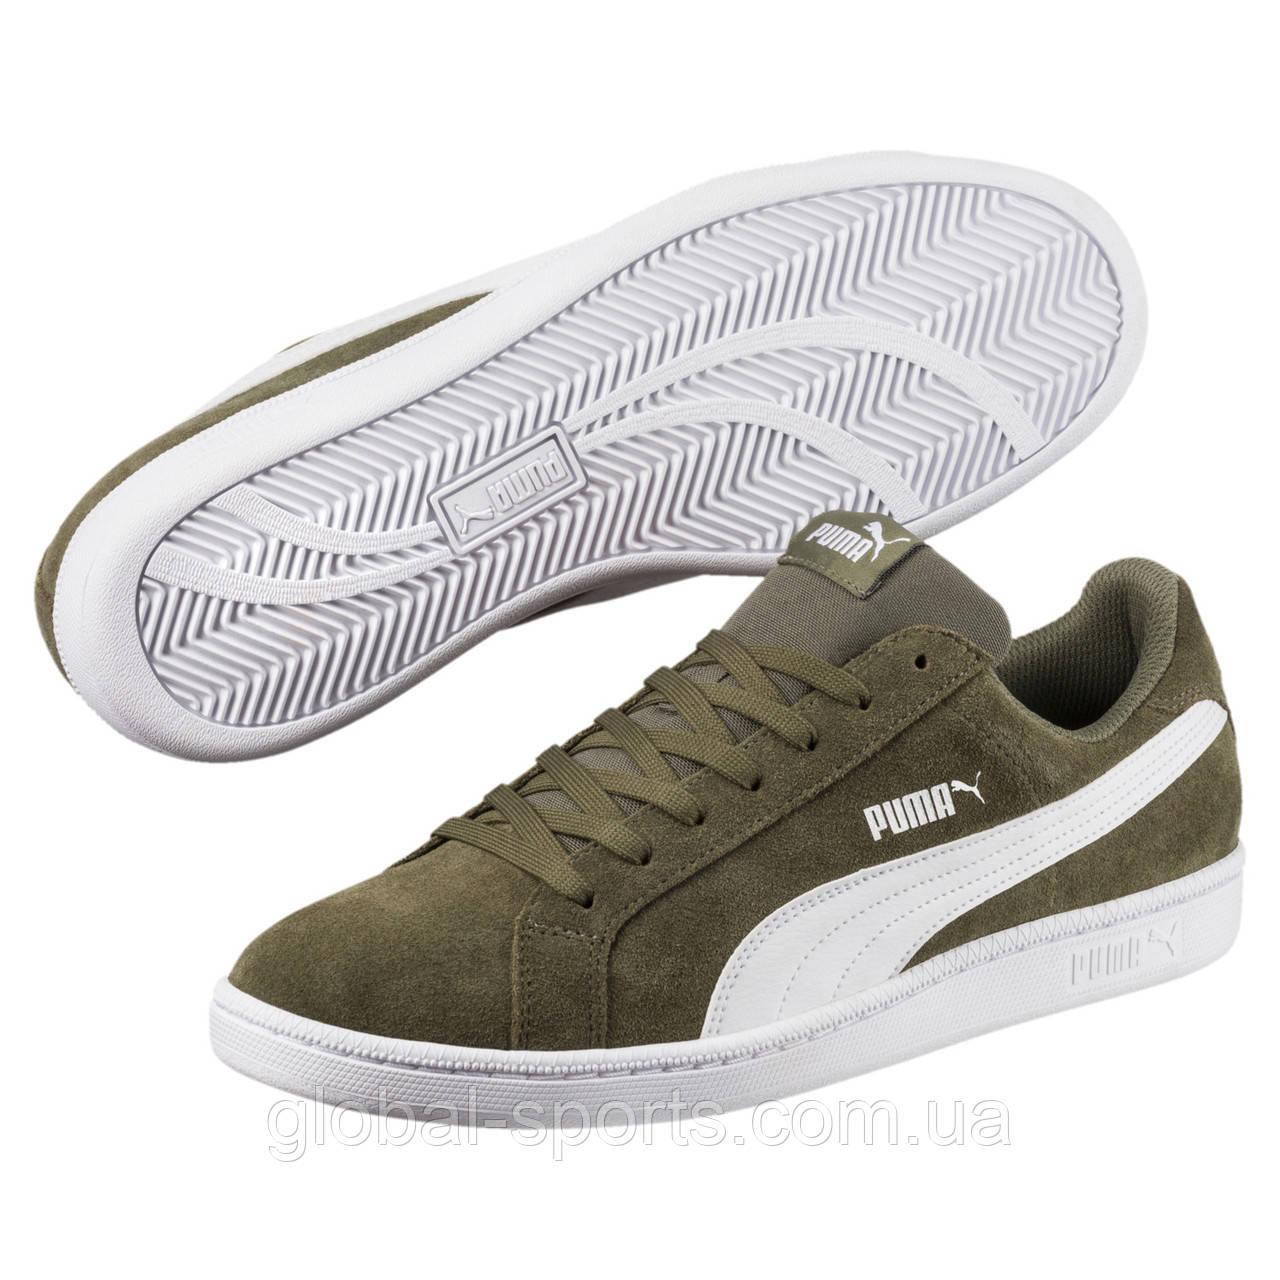 Мужские кроссовки Puma Smash SD (Артикул: 36173021)